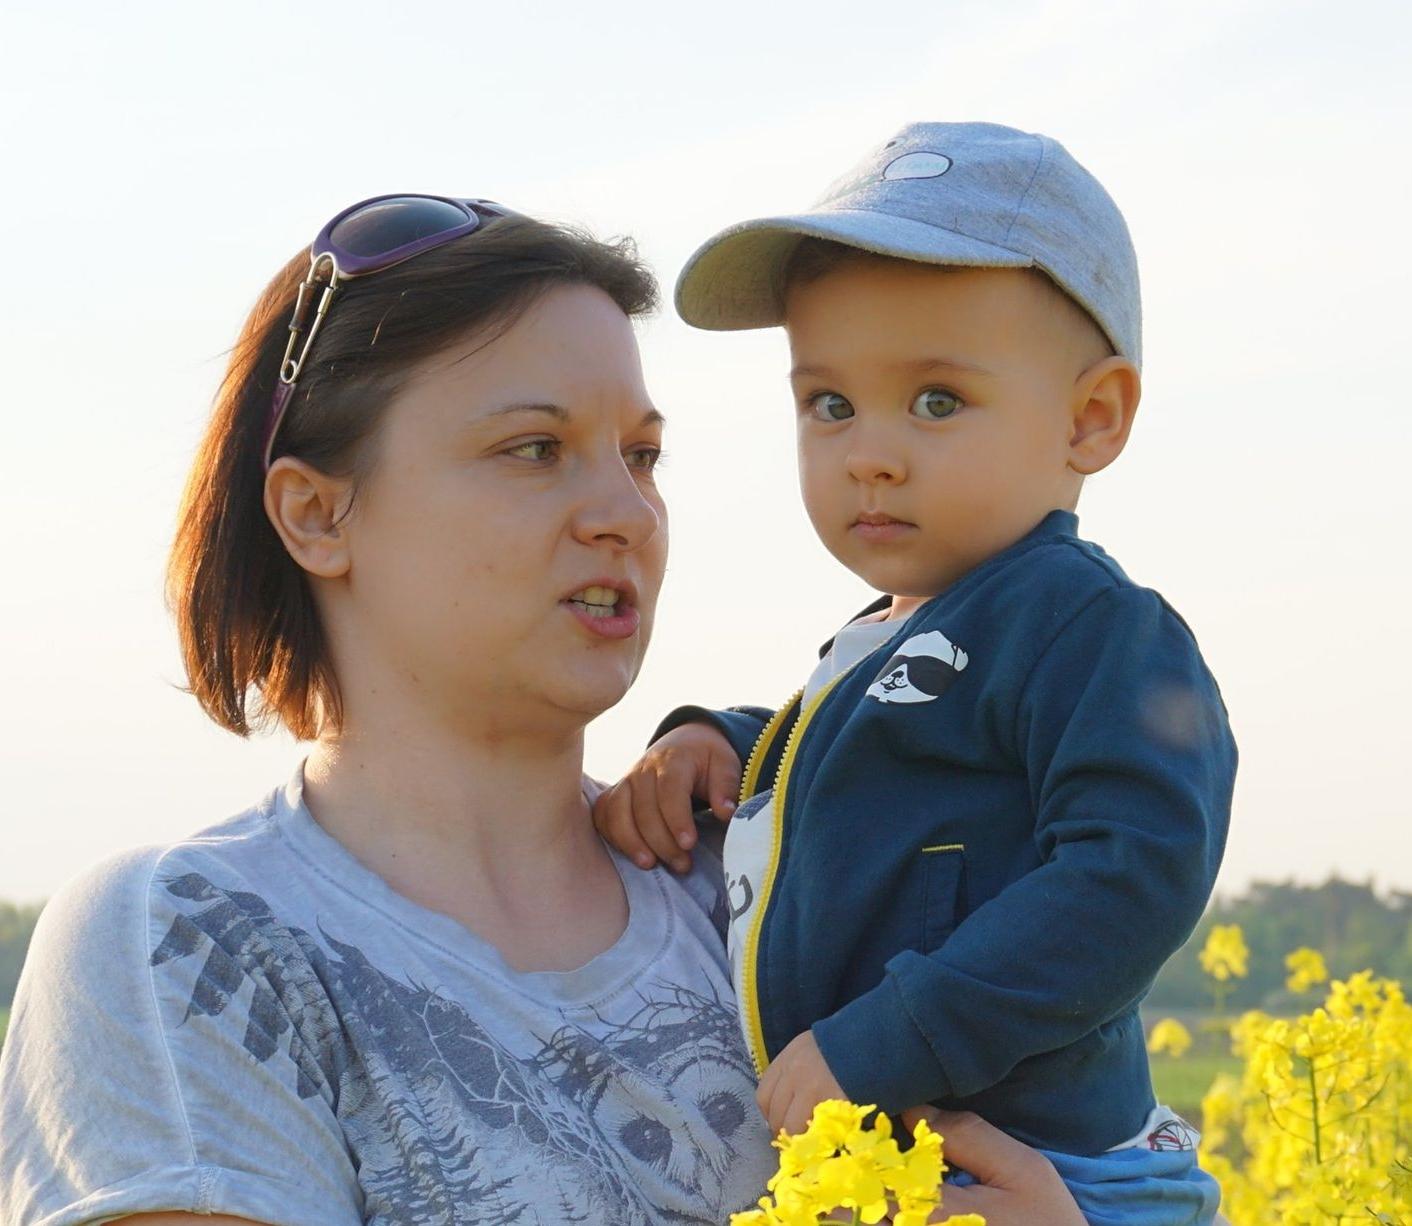 Dorota Koszelna